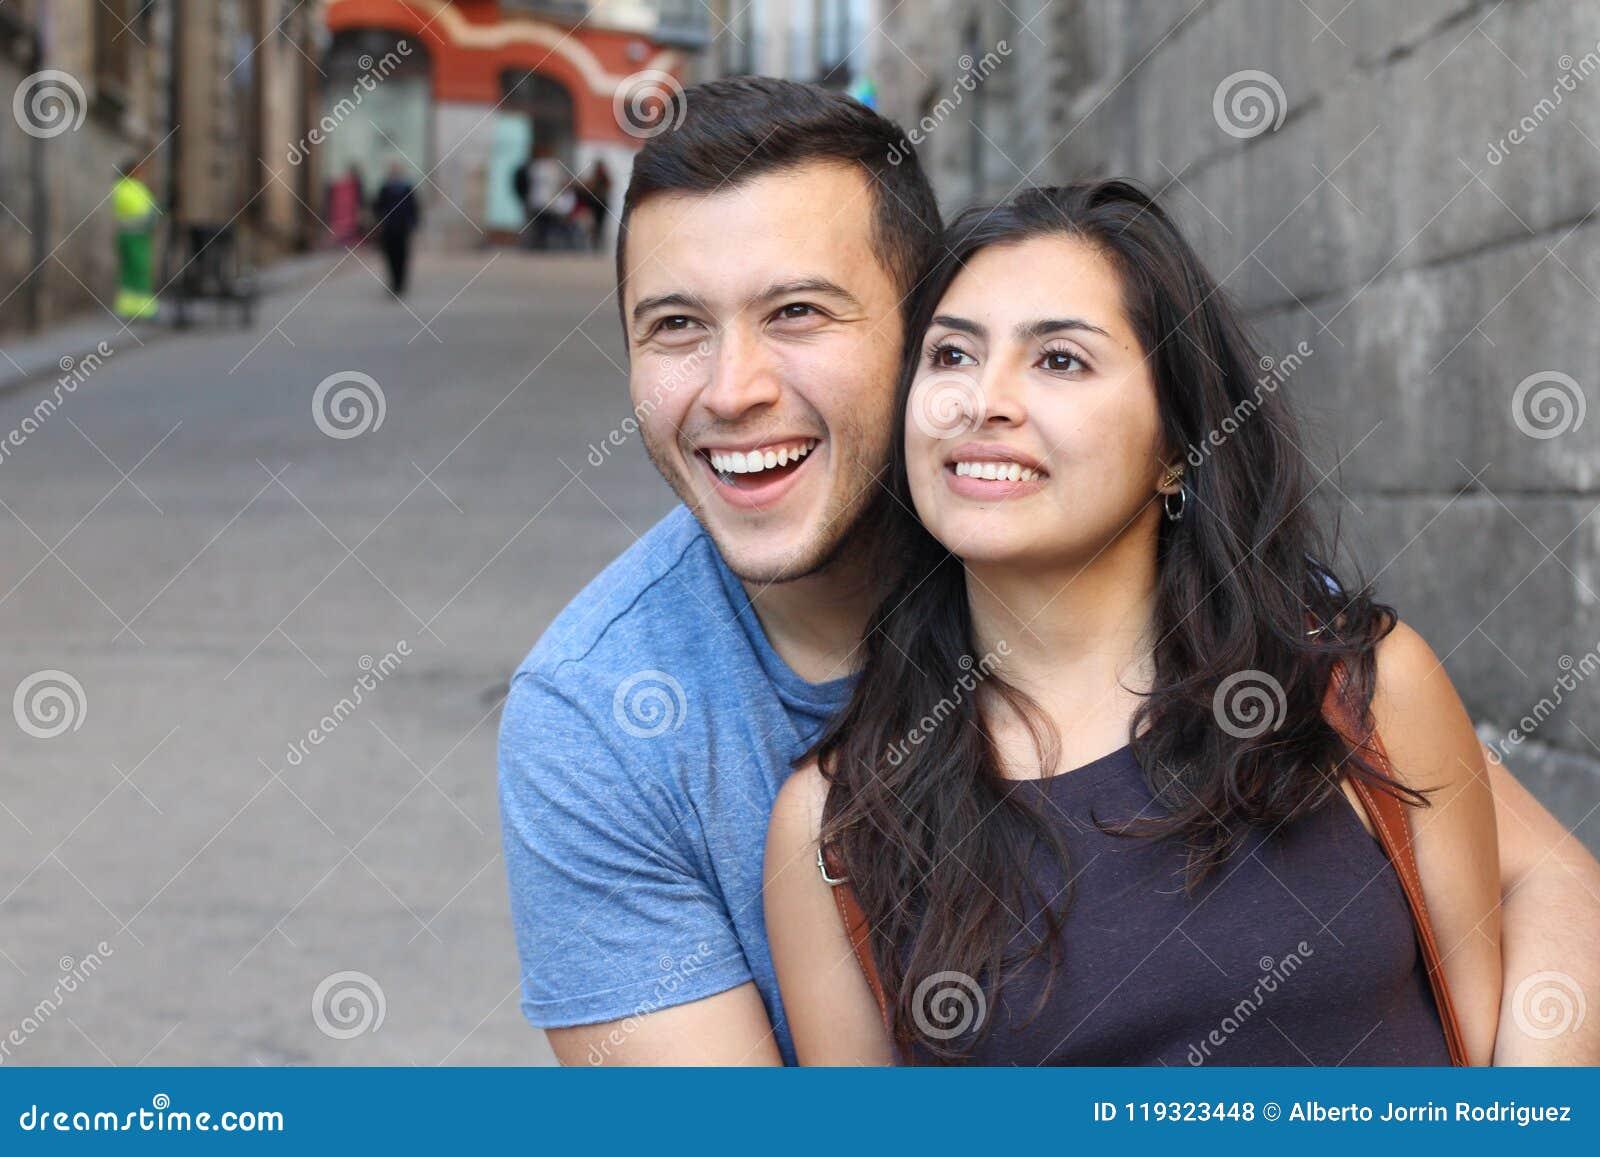 Beautiful latino couple smiling while looking away